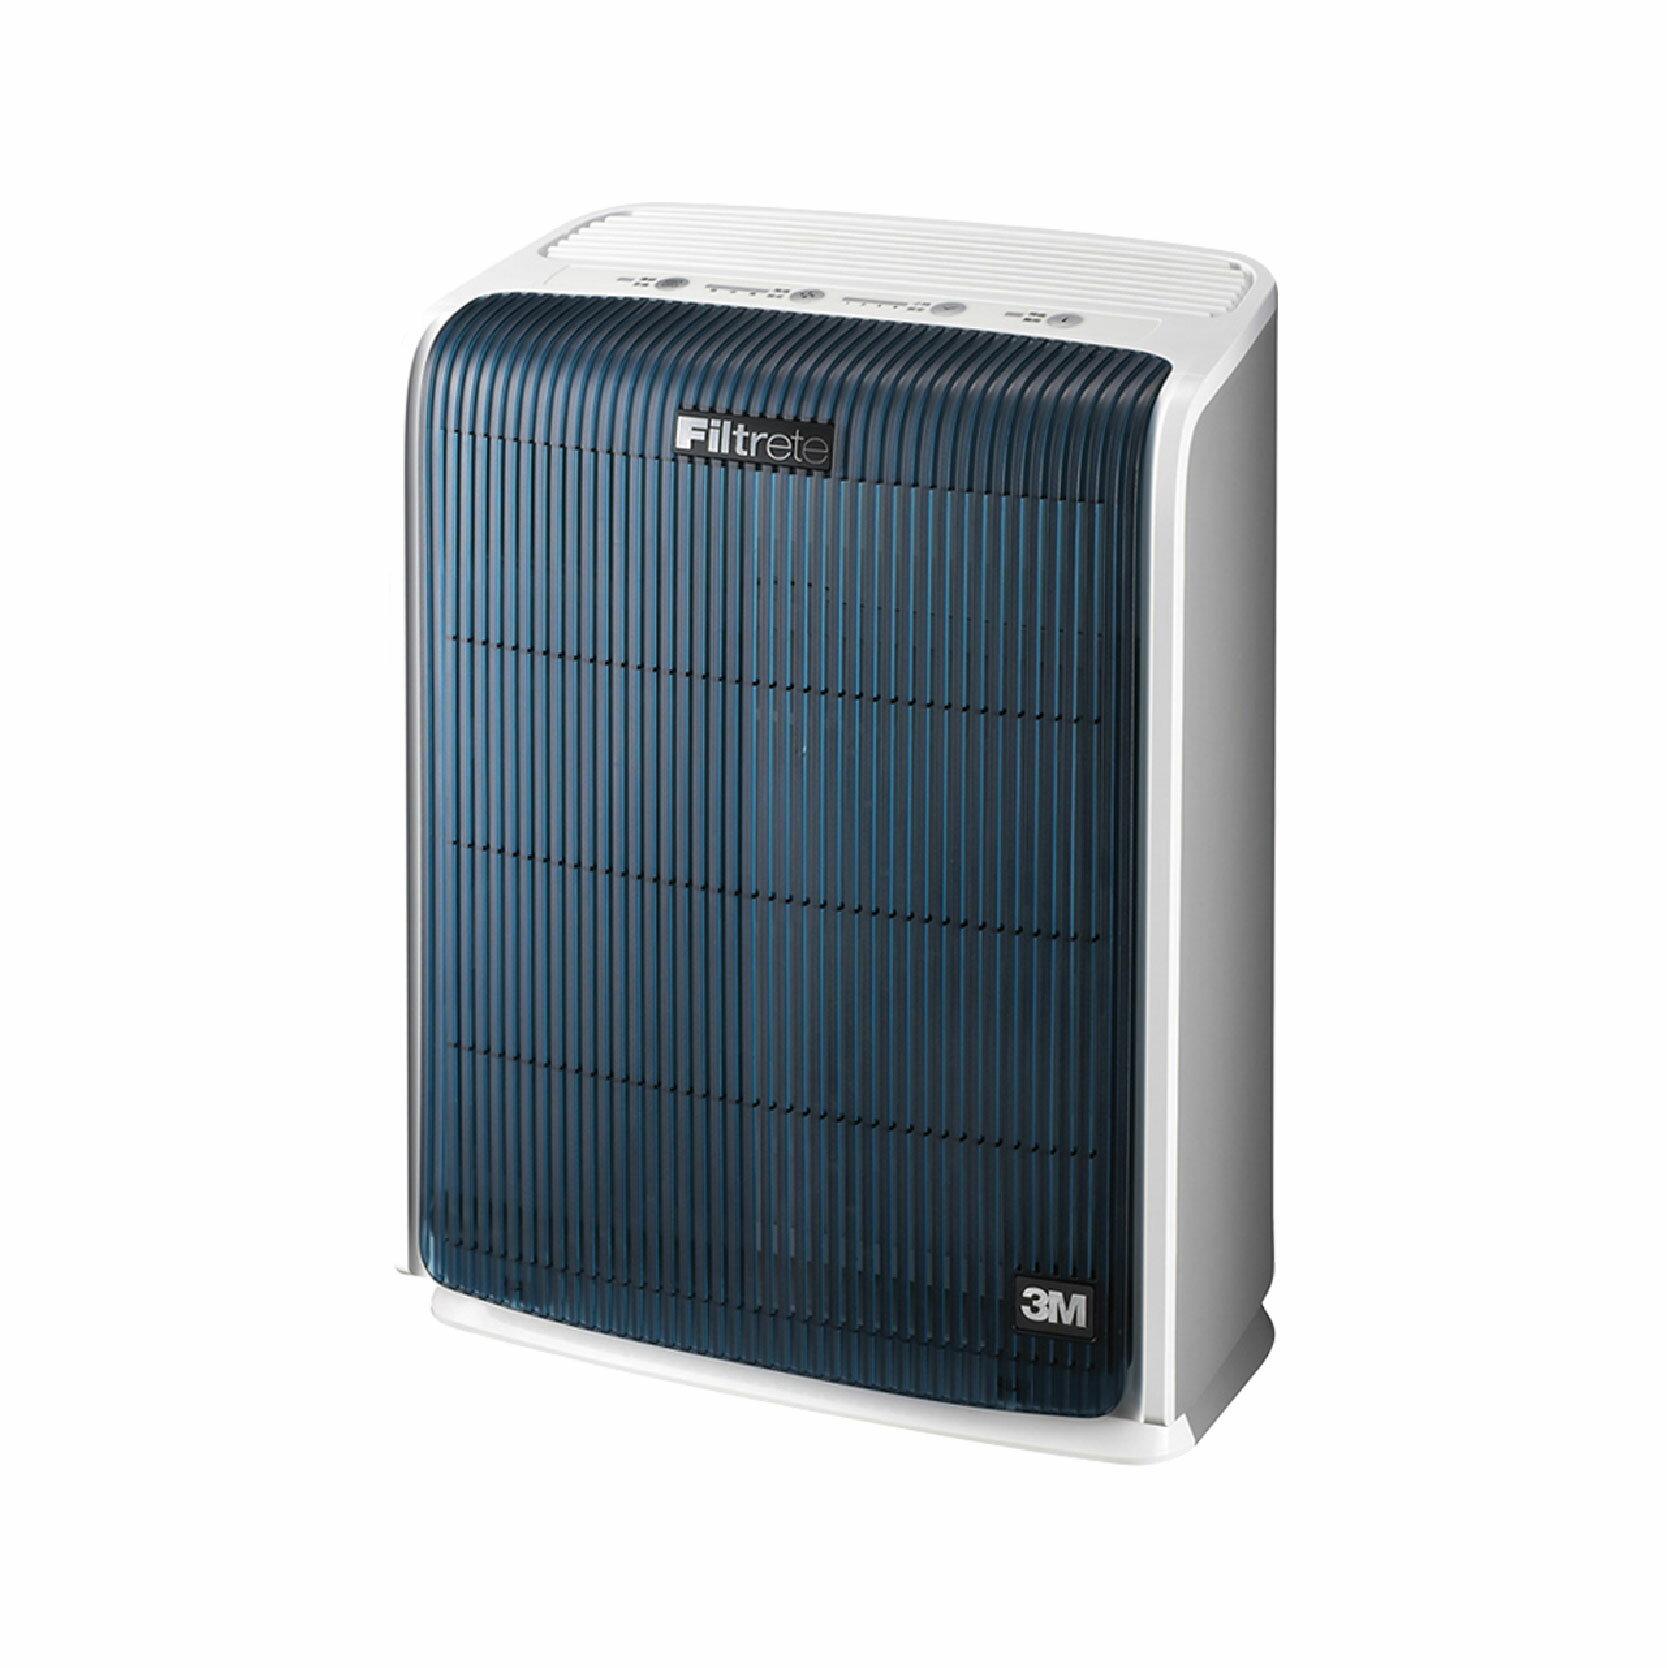 3M 淨呼吸 極淨型空氣清淨機 FA-T20AB 除臭 除菌 吸附灰塵 空氣清淨機 強效過濾 除去過敏原 活性碳濾網 負離子清淨